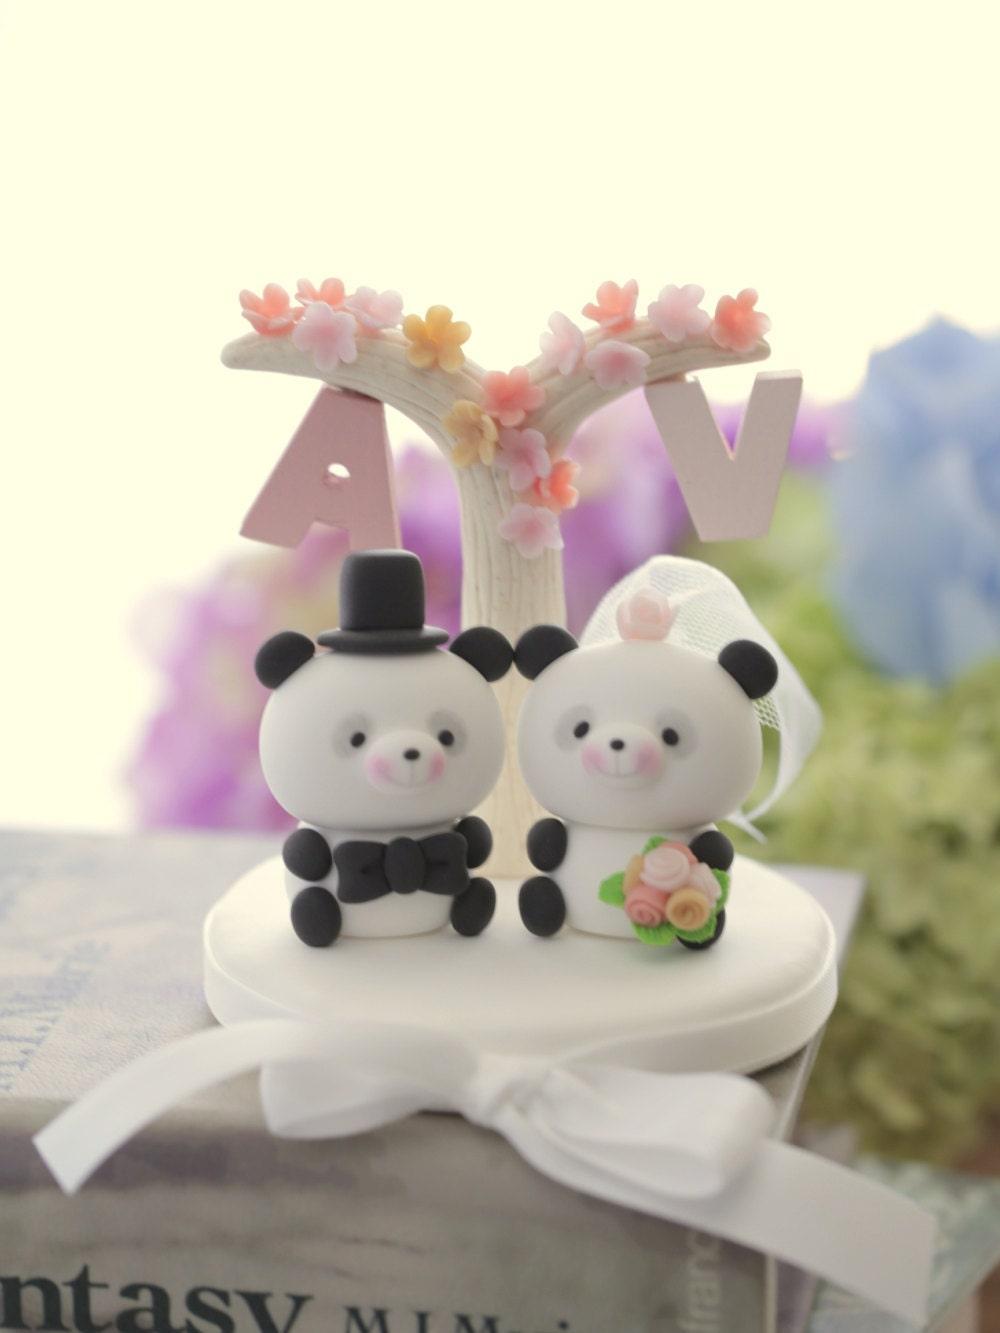 Panda wedding cake topper k954 e10261624442418340m 4399 panda wedding cake topper k954 junglespirit Gallery